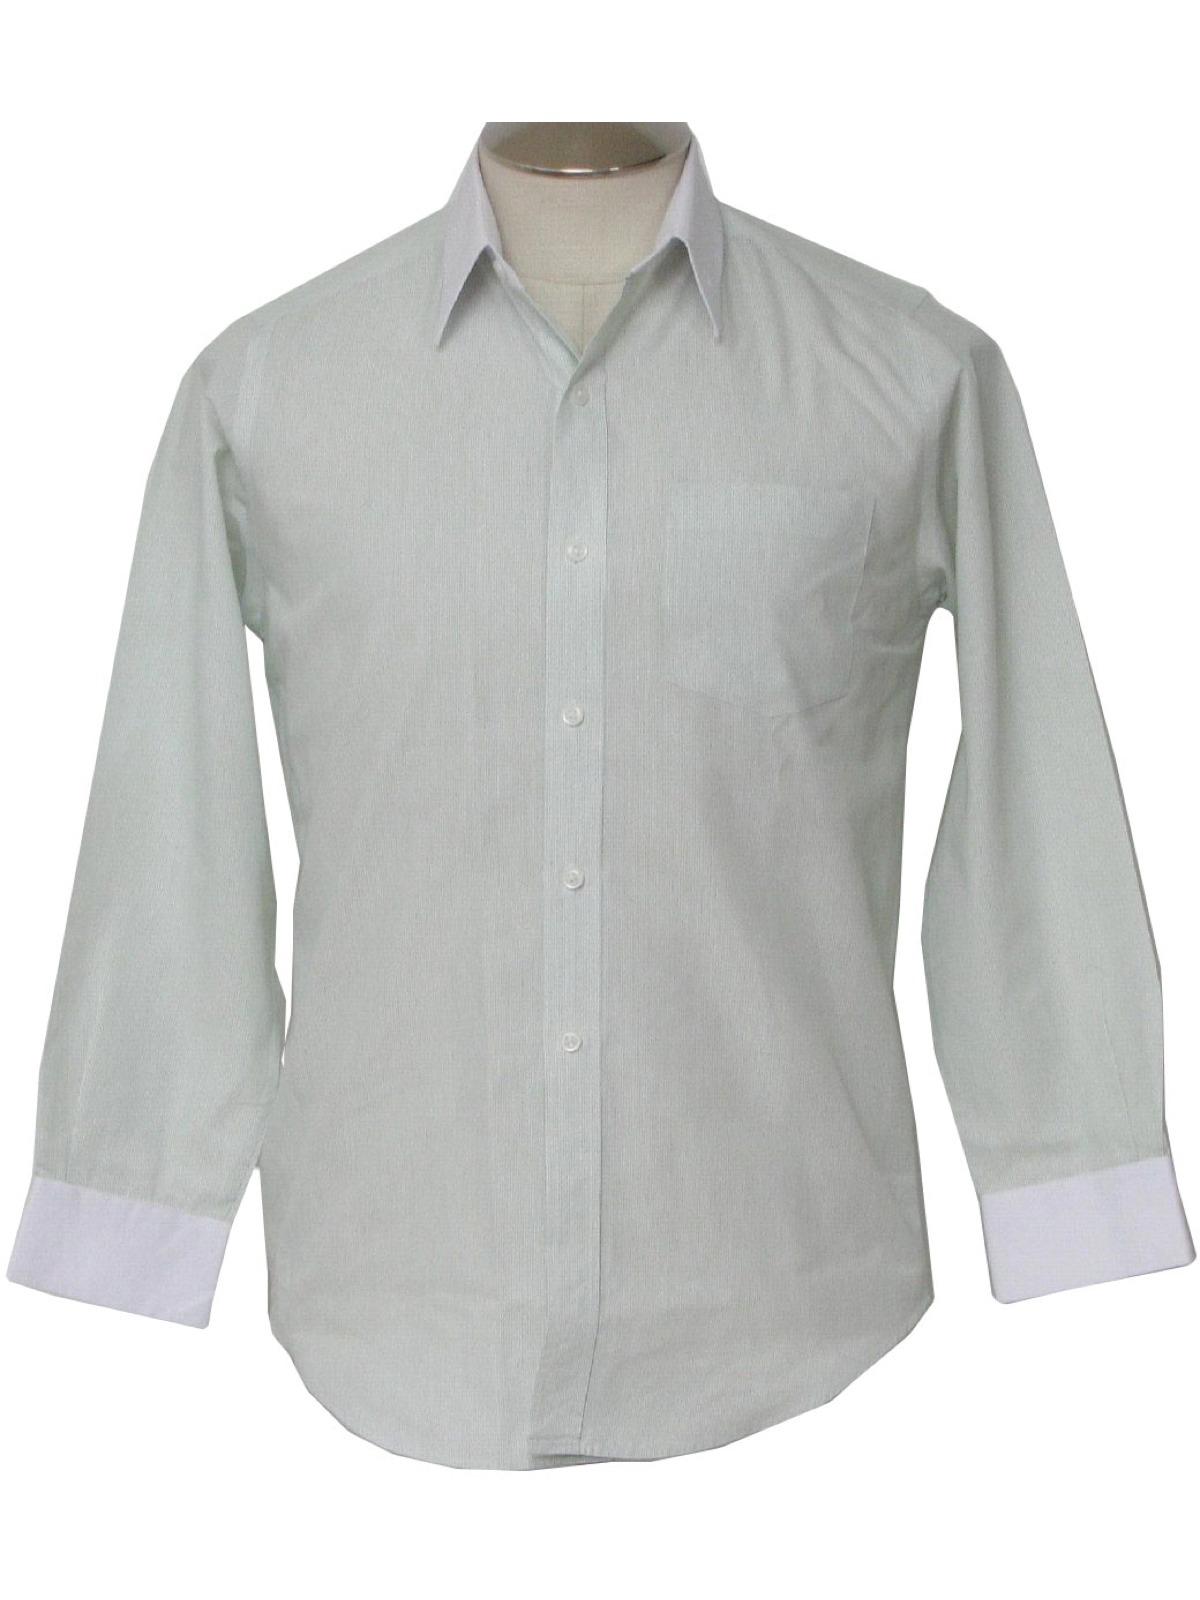 18210274bcb Nineties Vintage Shirt  90s -Ravi- Mens green